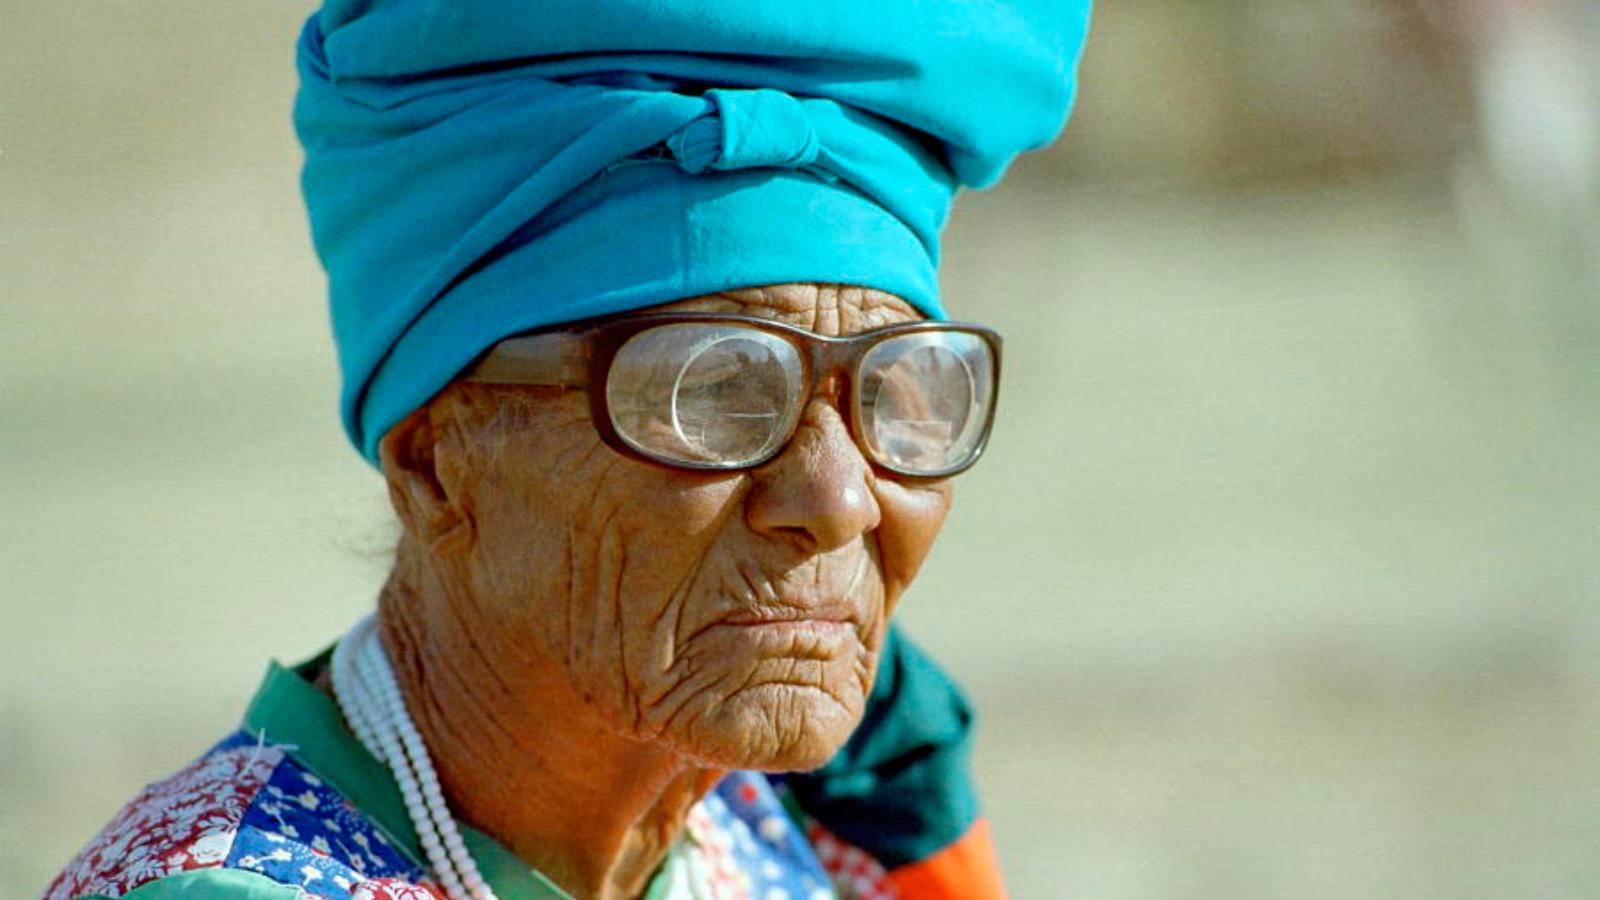 Elder Abuse Online event - Aging Project